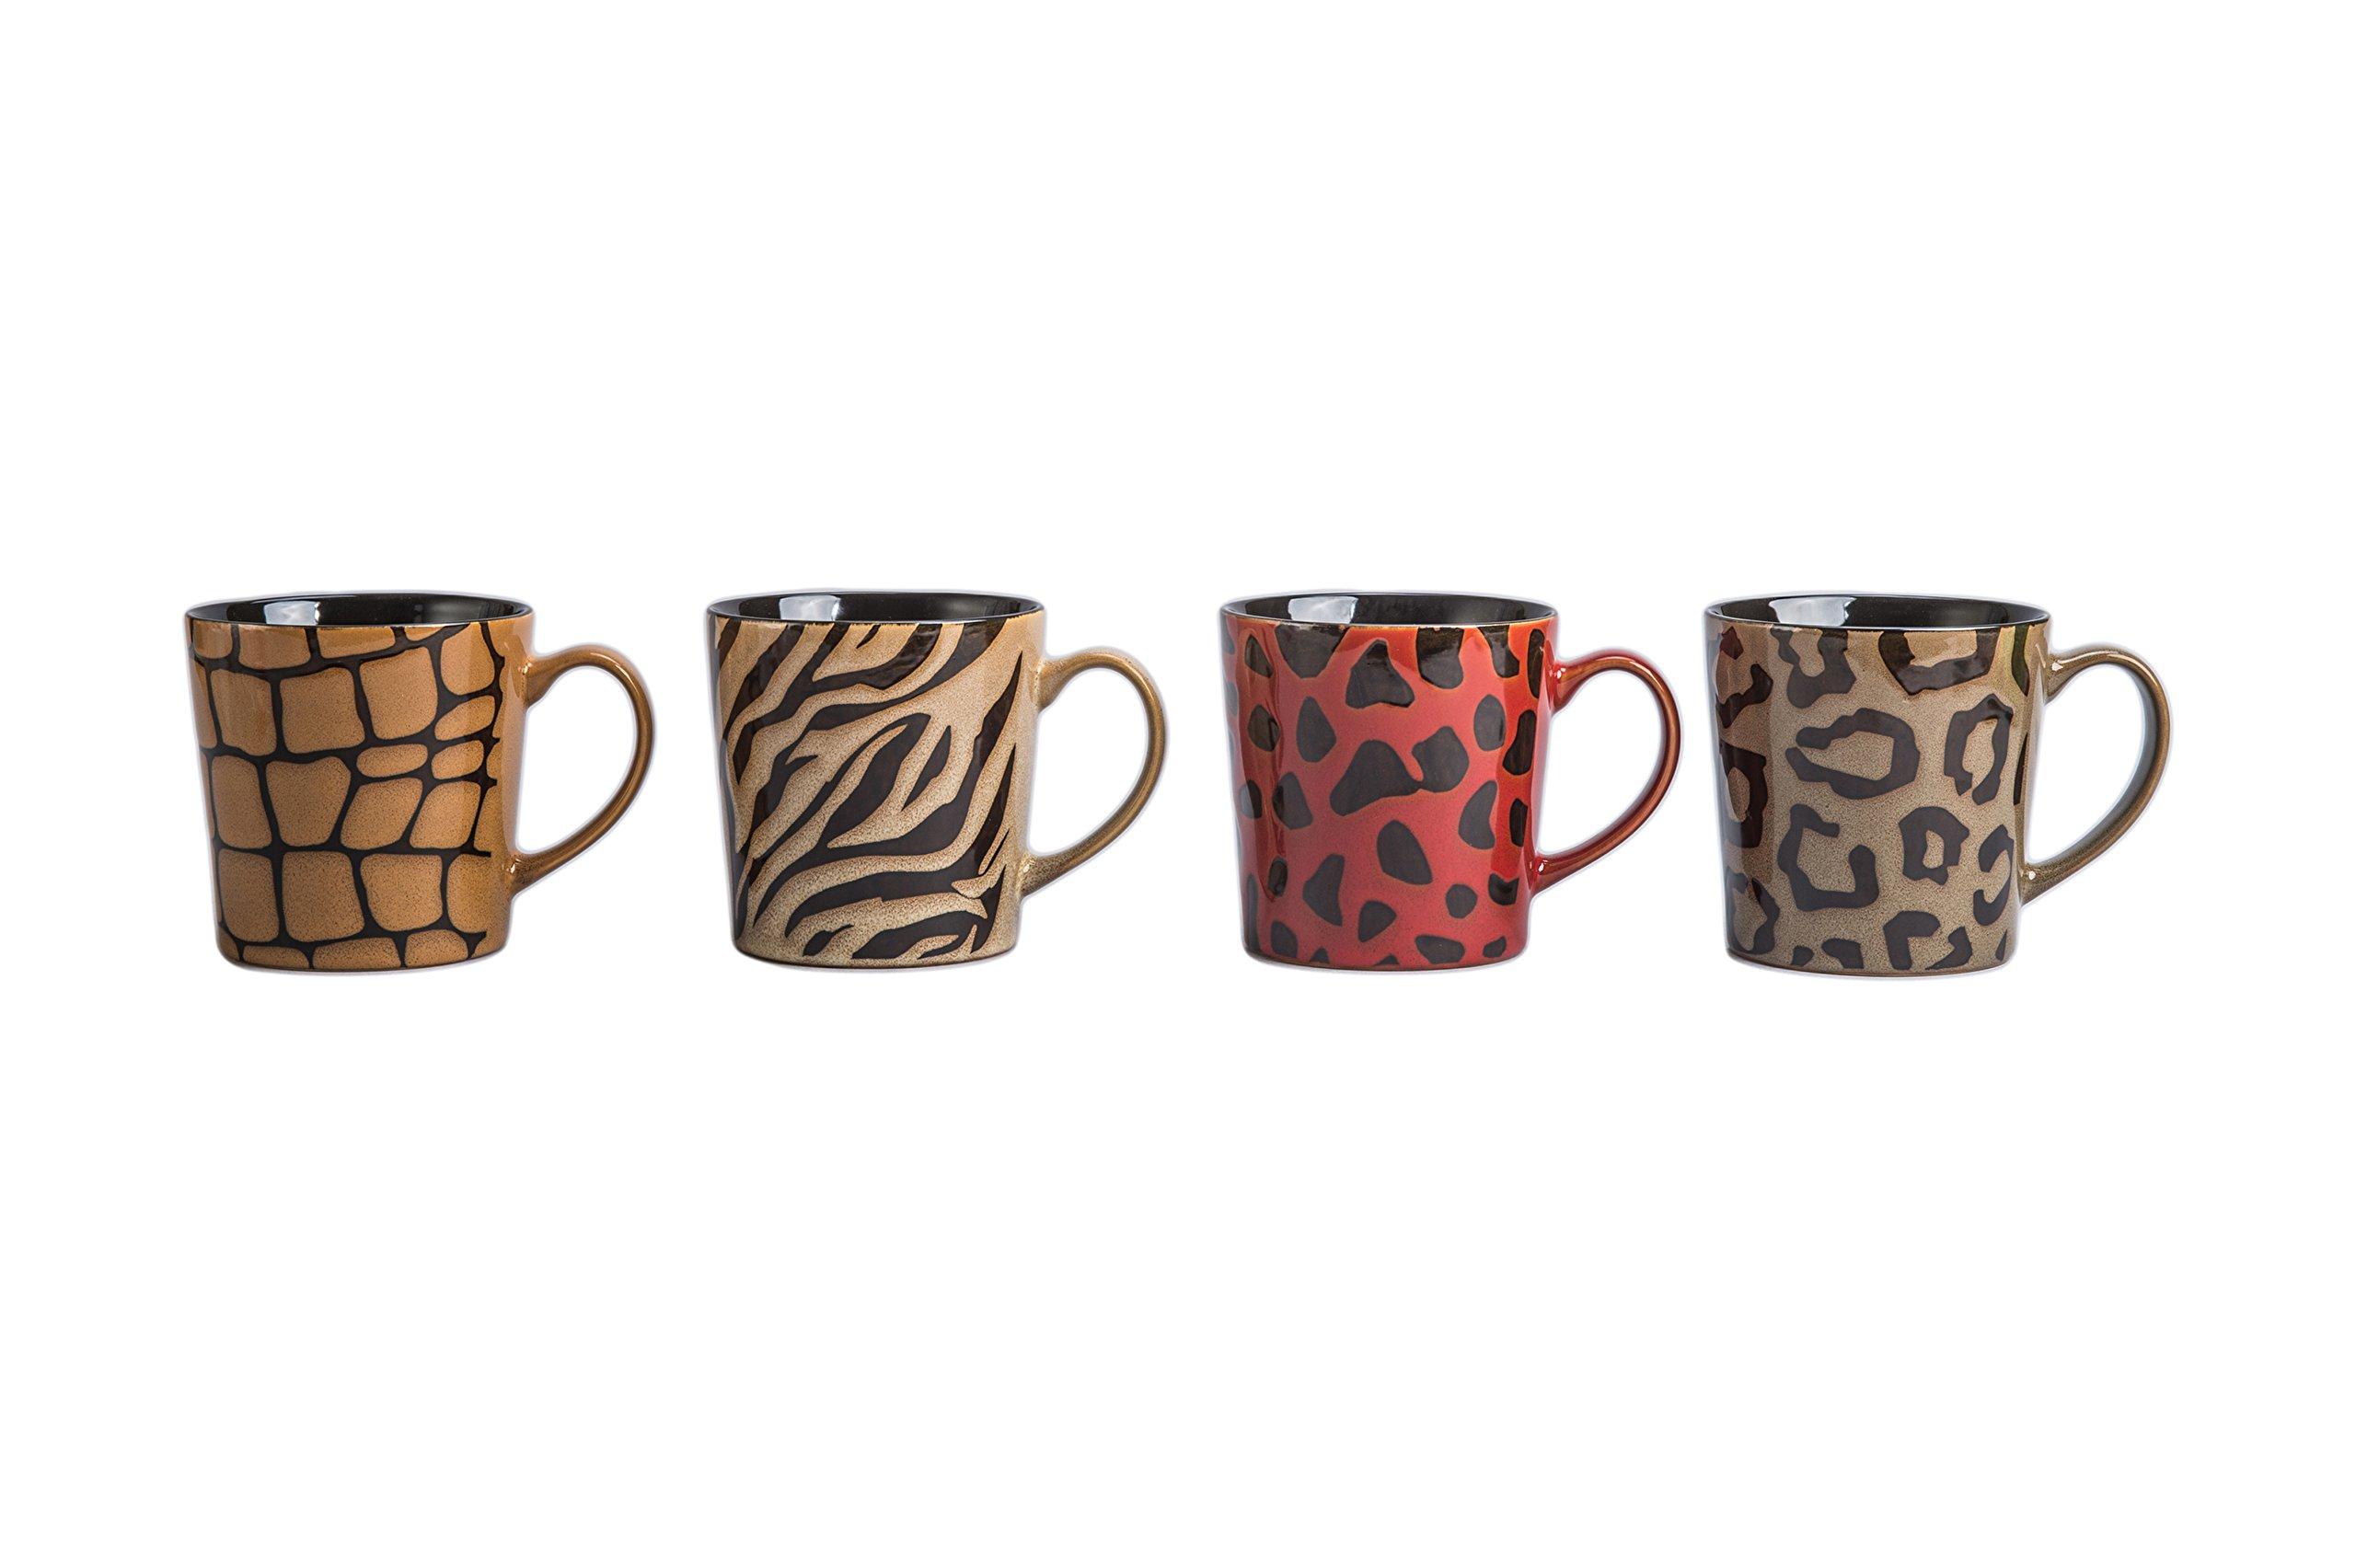 BIA Cordon Bleu 17-Ounce Safari Mug, Set of 4, Assorted Animal Print Designs by BIA Cordon Bleu (Image #1)